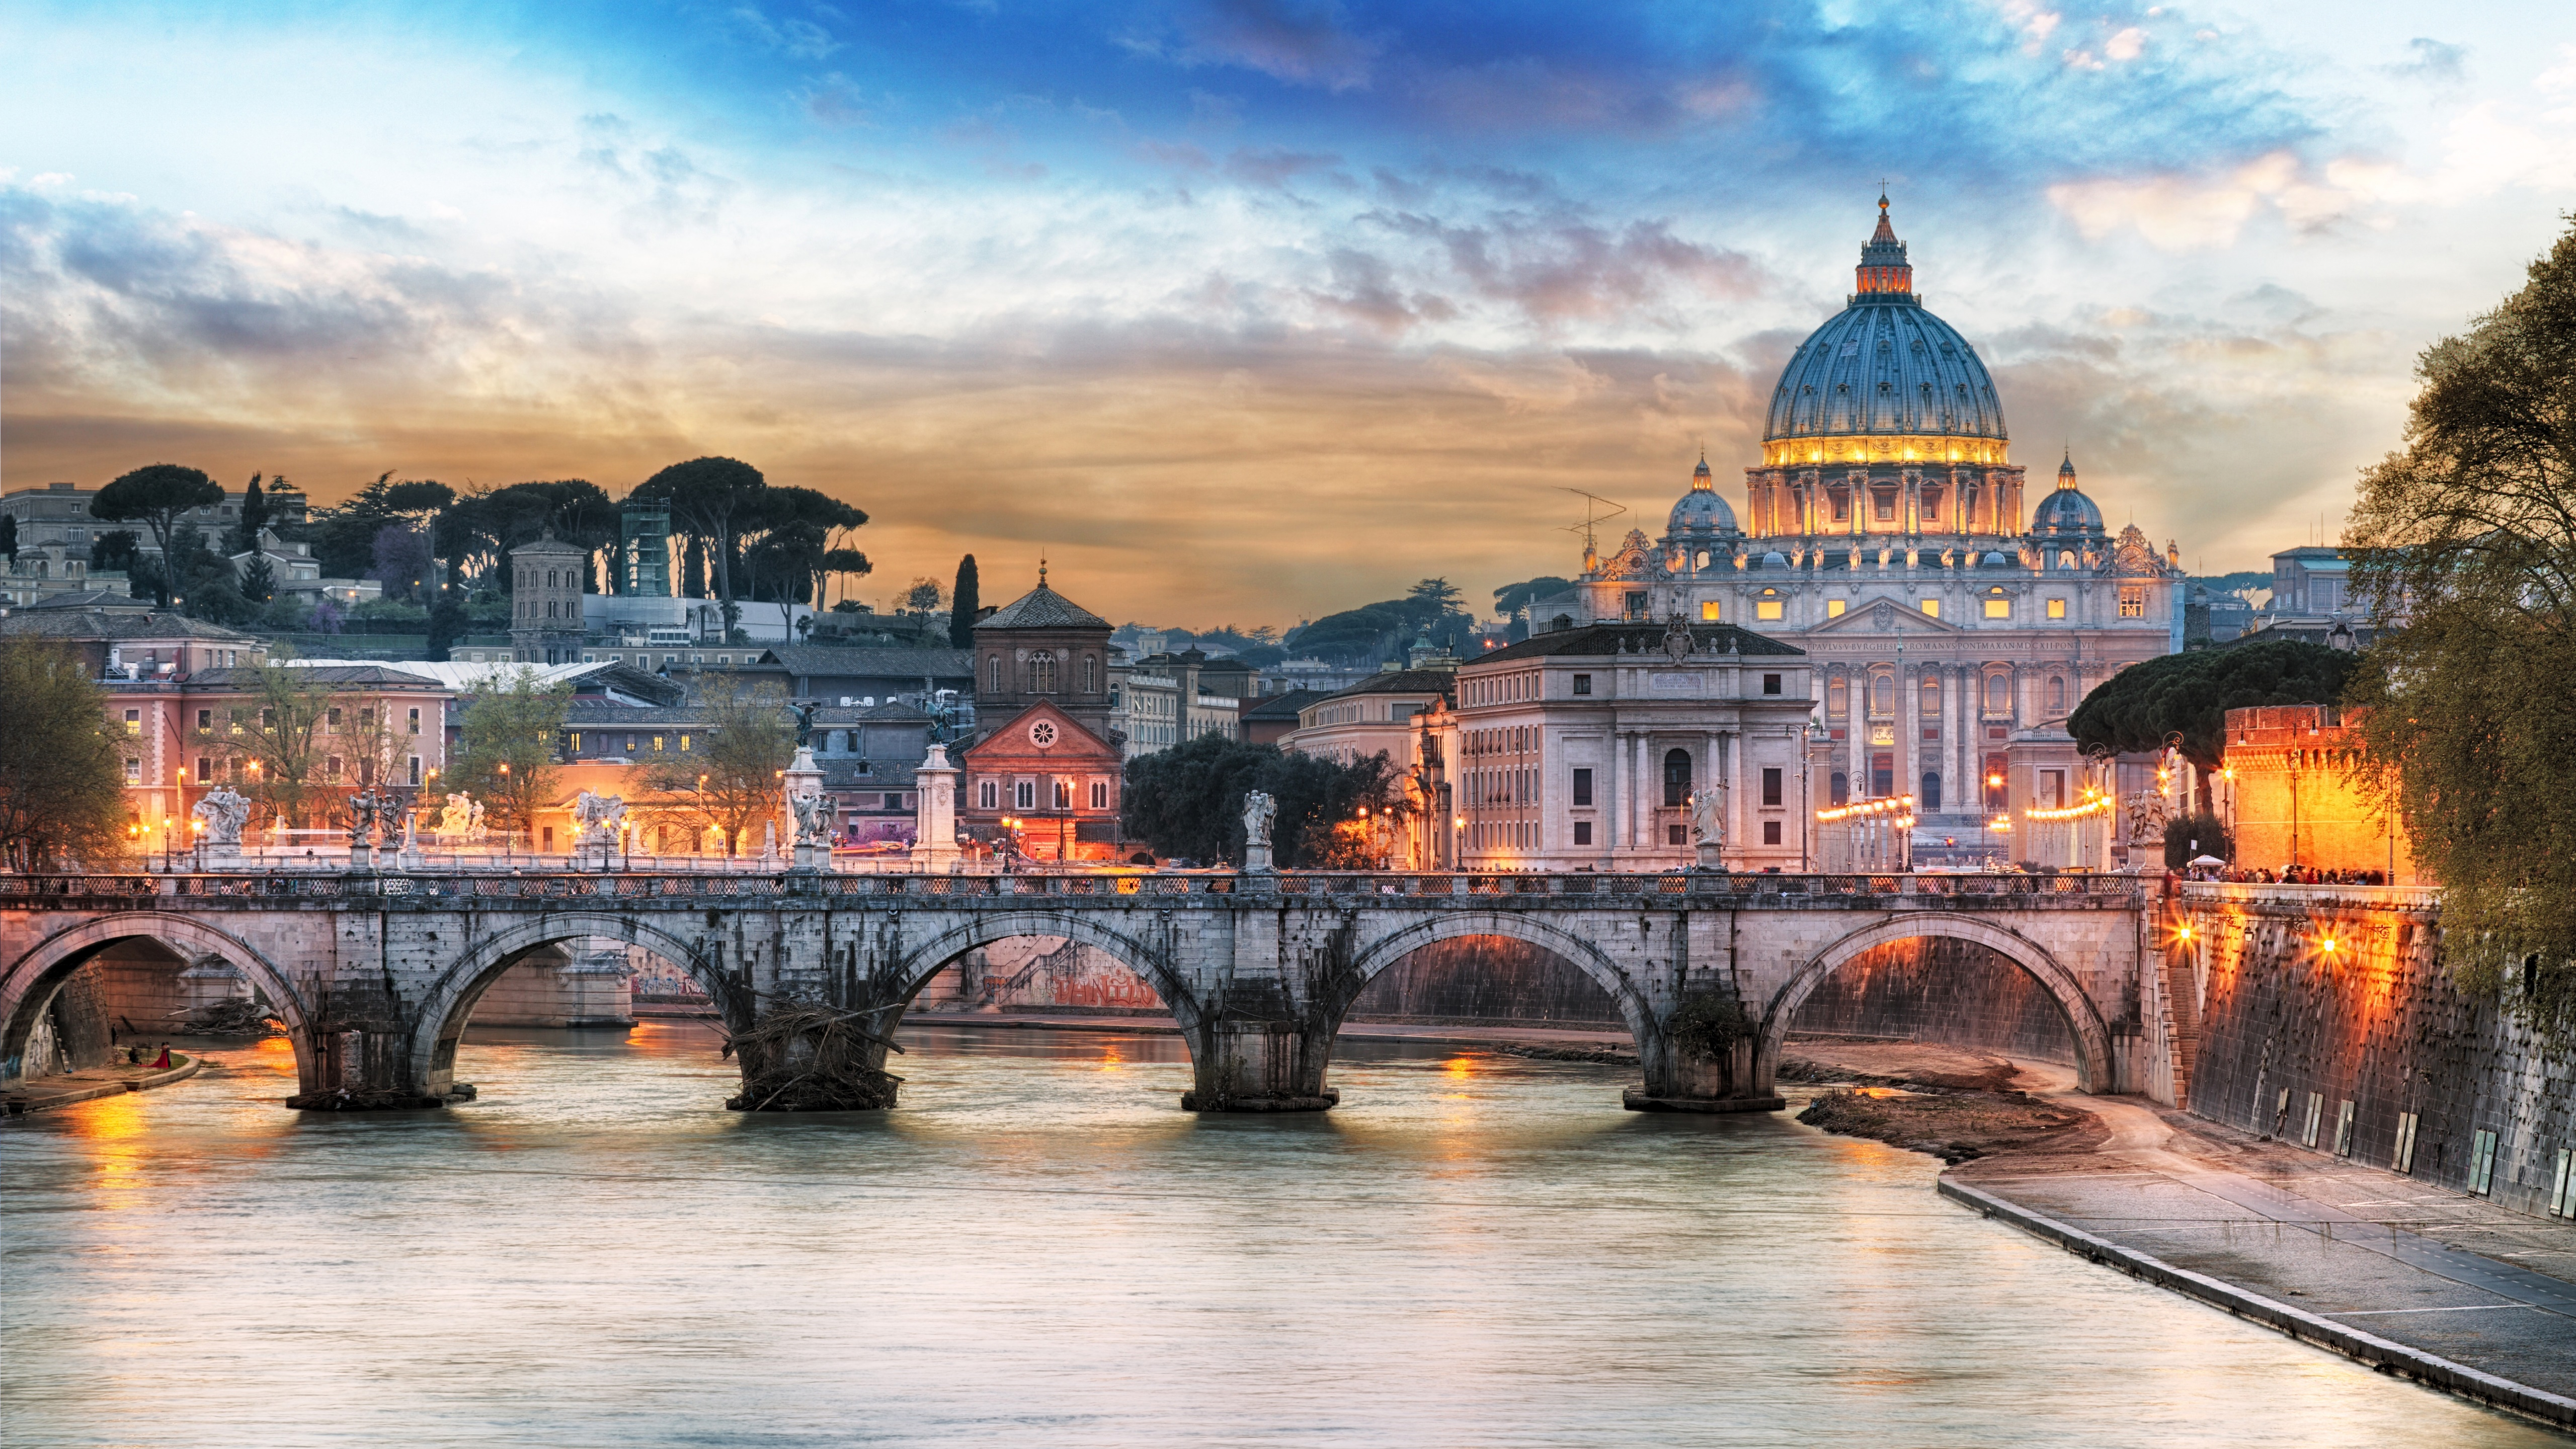 St. Angelo Bridge, Rome wallpaper